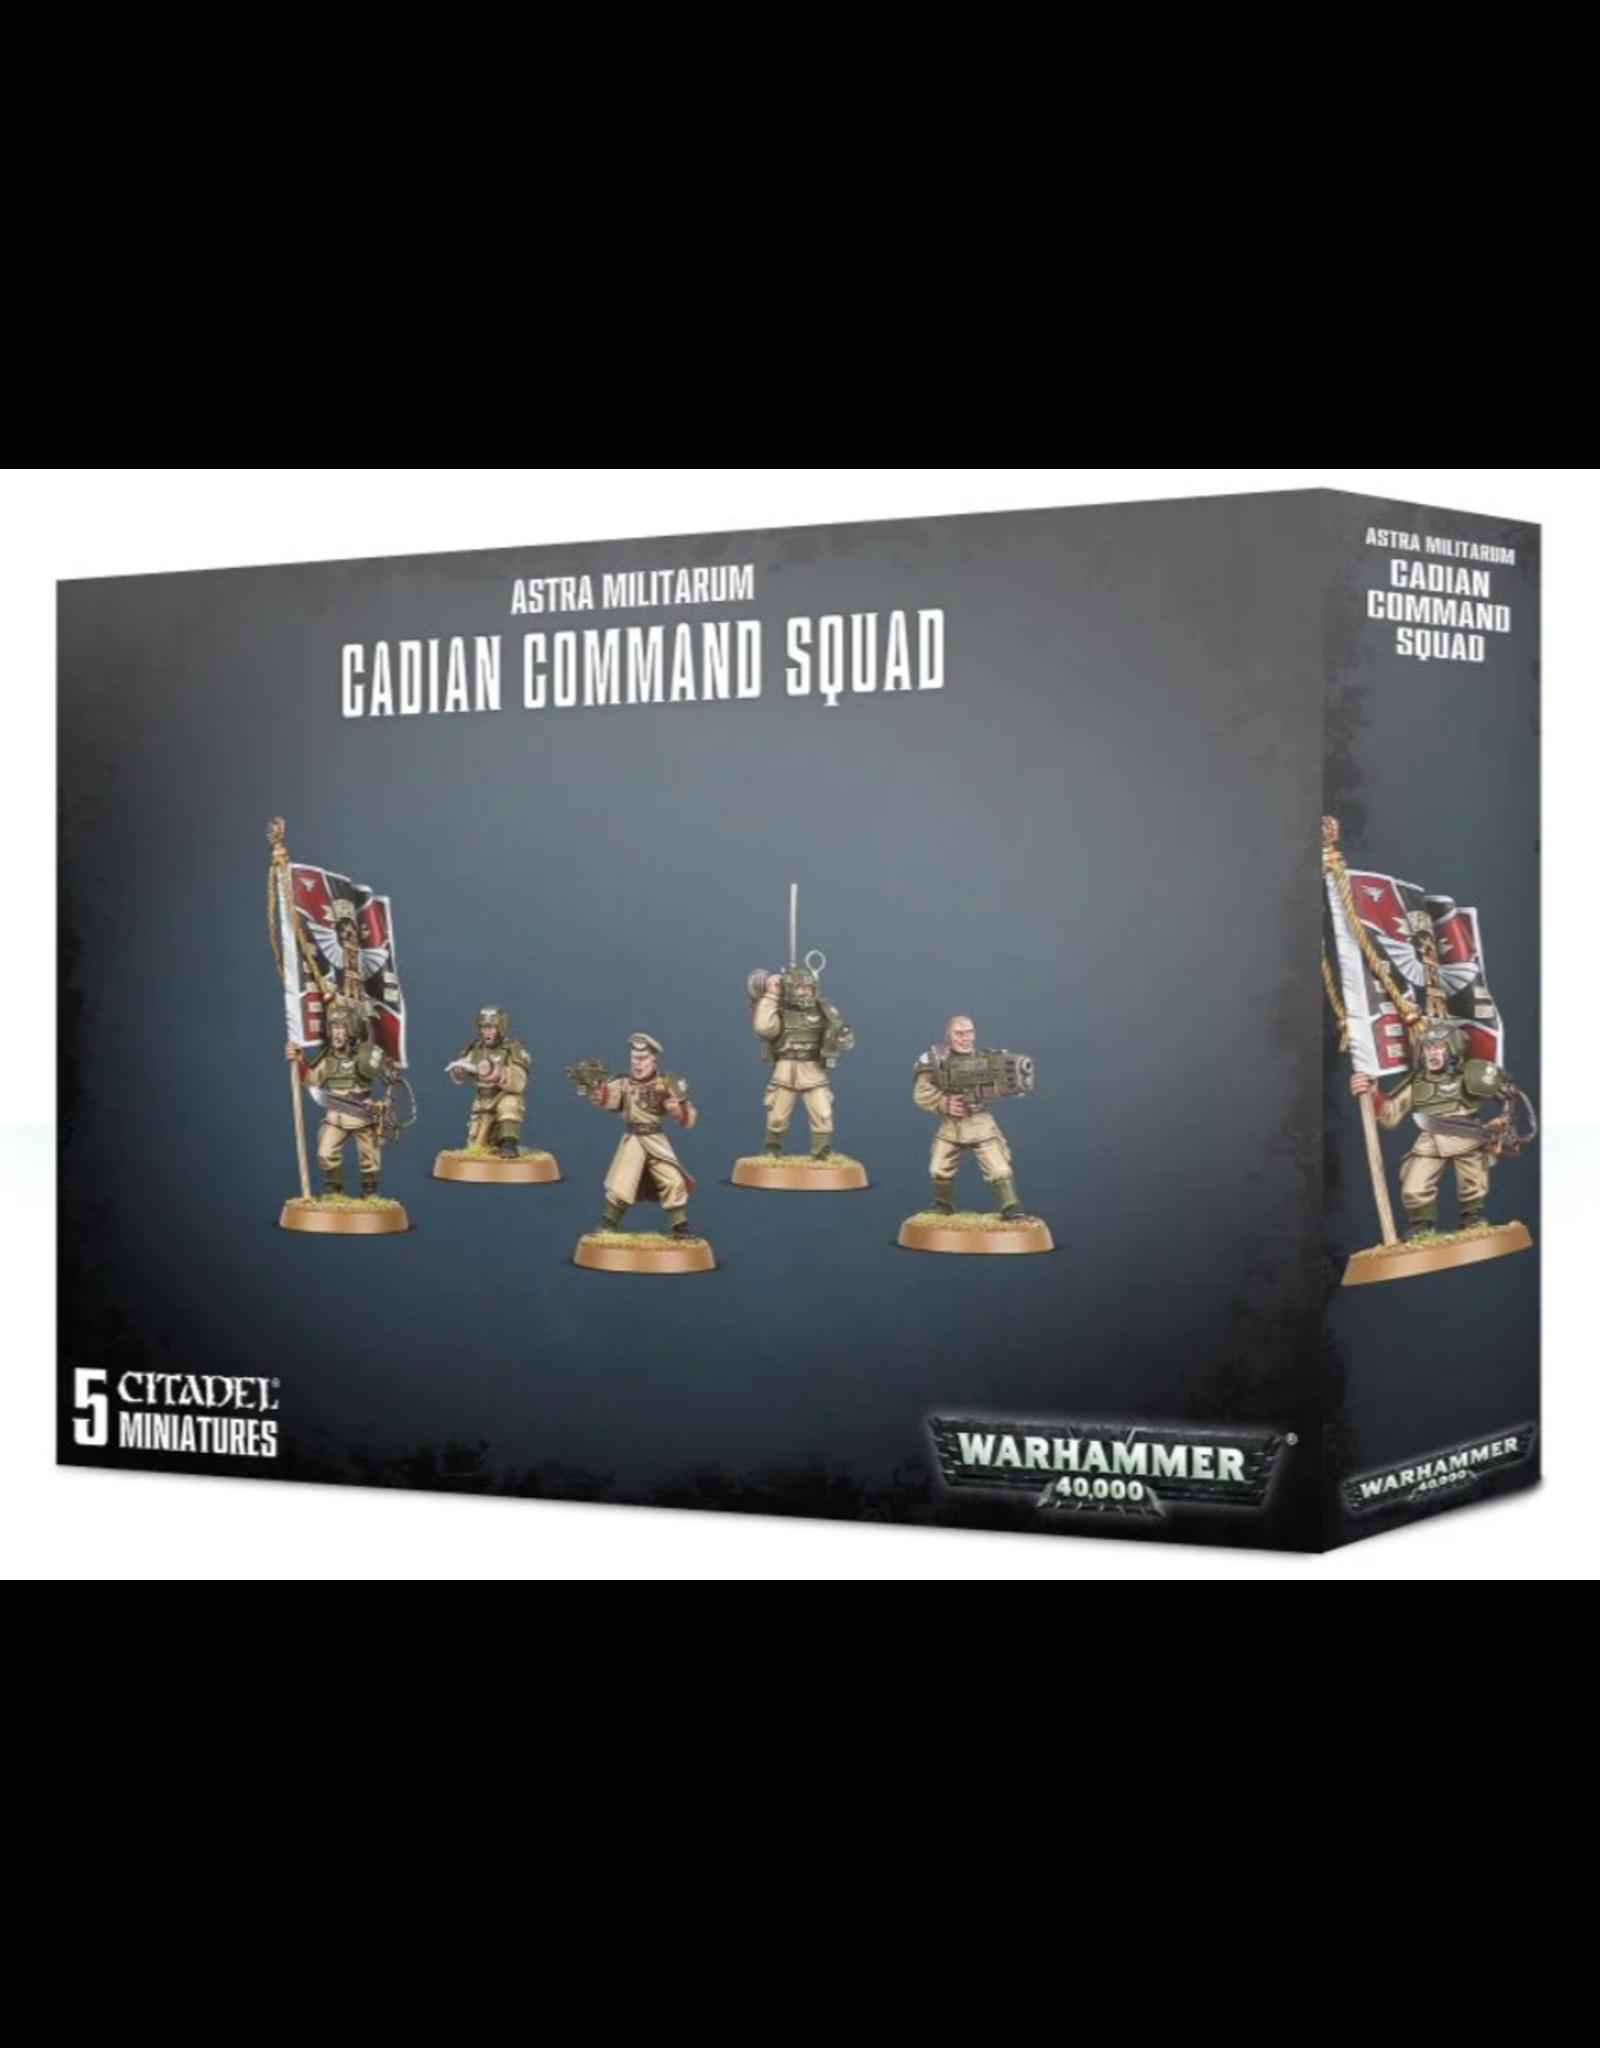 Warhammer 40K Astra Militarum Cadian Command Squad